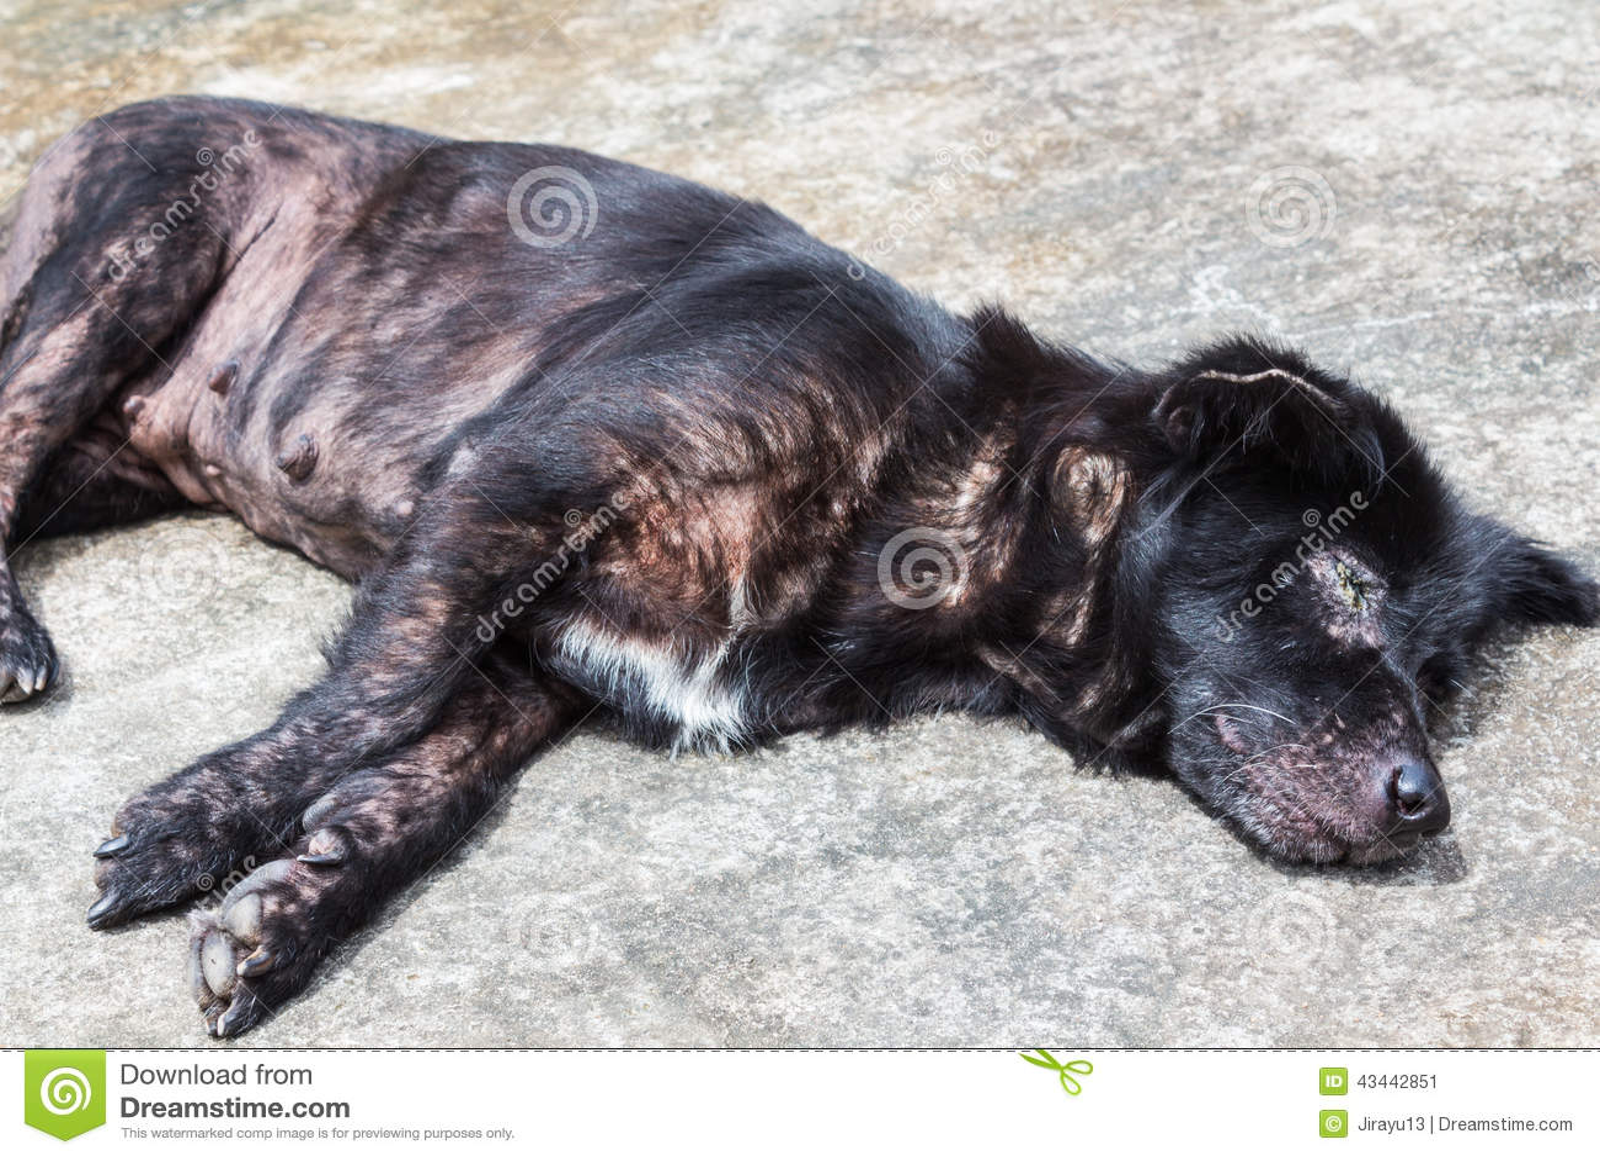 dog skin disorders mange submited images